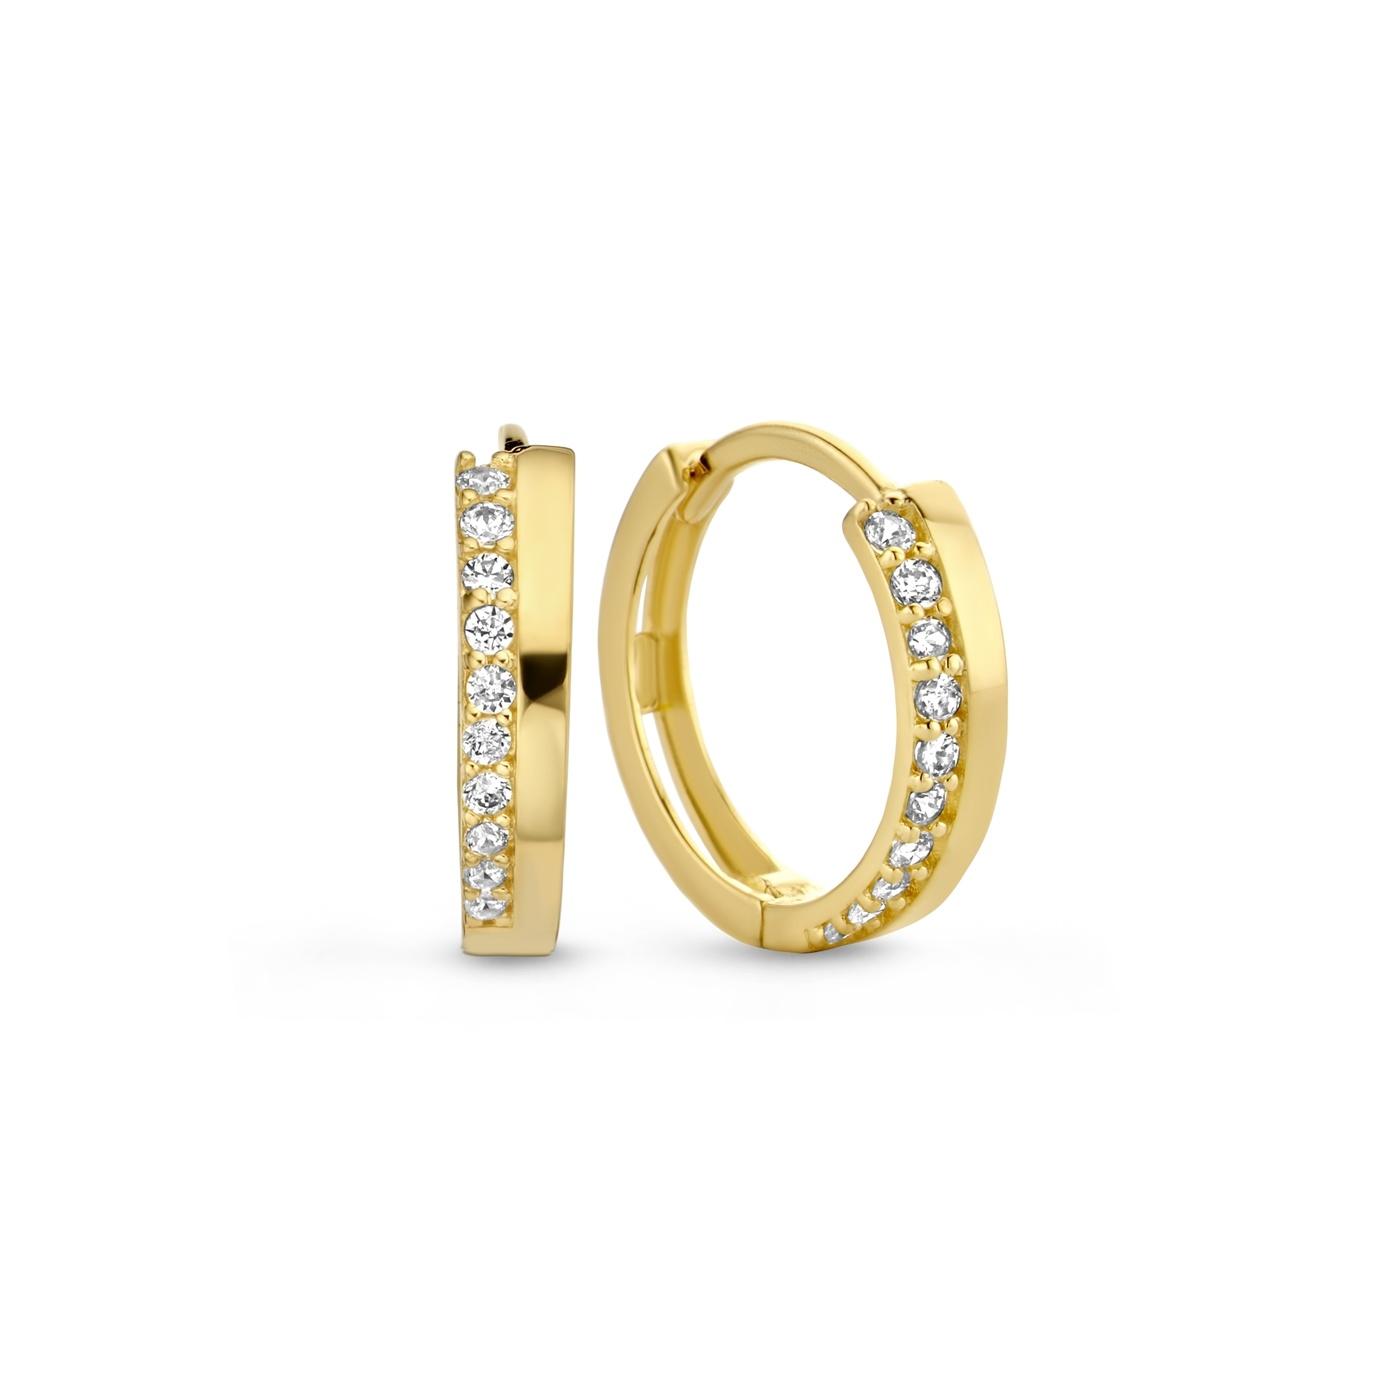 Isabel Bernard Le Marais Louna créoles en or 14 carats